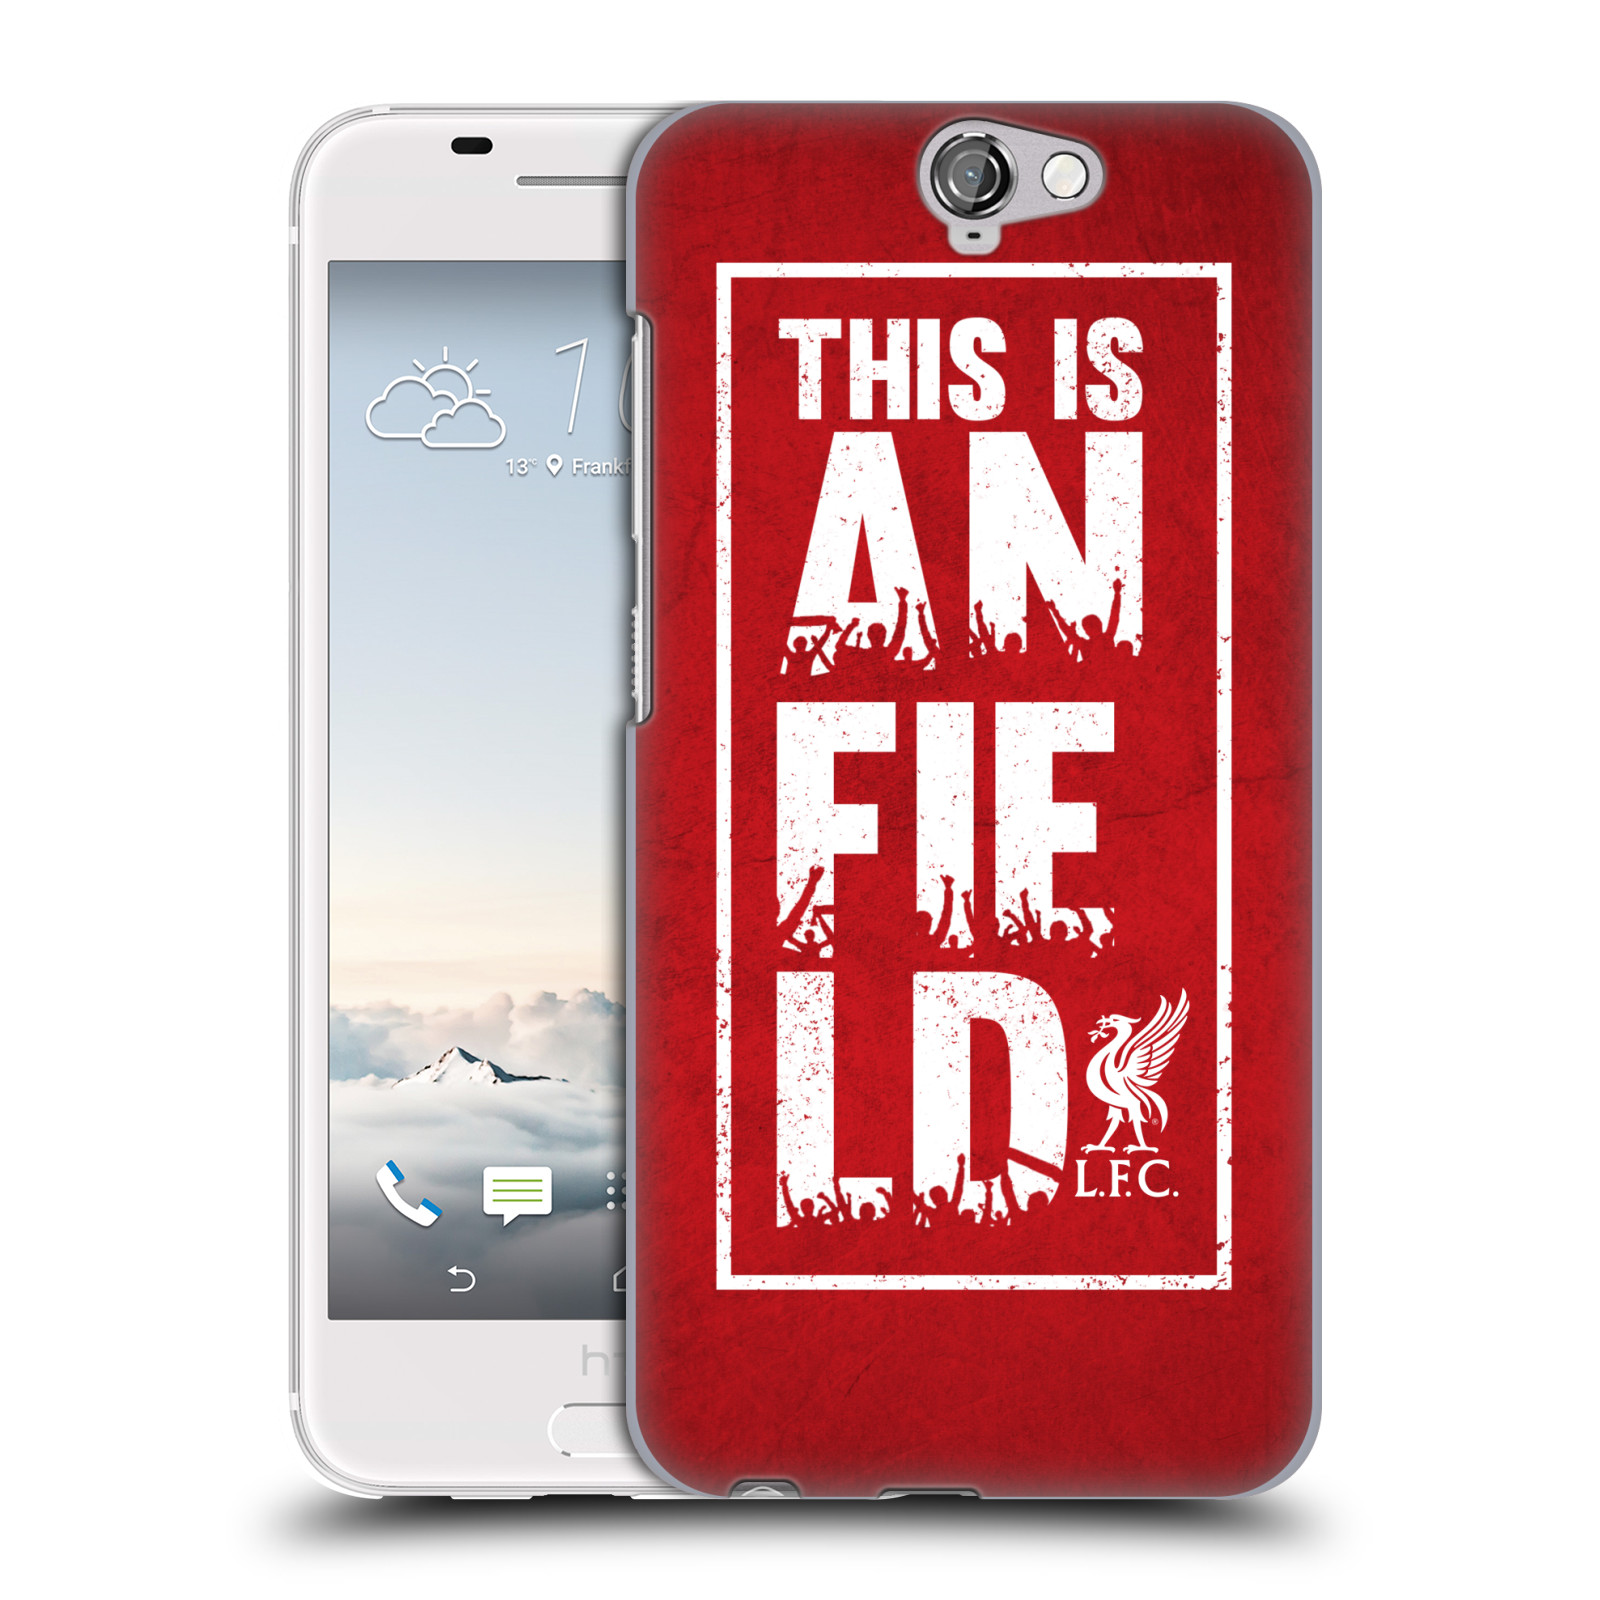 Plastové pouzdro na mobil HTC One A9 HEAD CASE Liverpool FC This Is Anfield Red (Kryt či obal na mobilní telefon Liverpool FC Official pro HTC One A9)